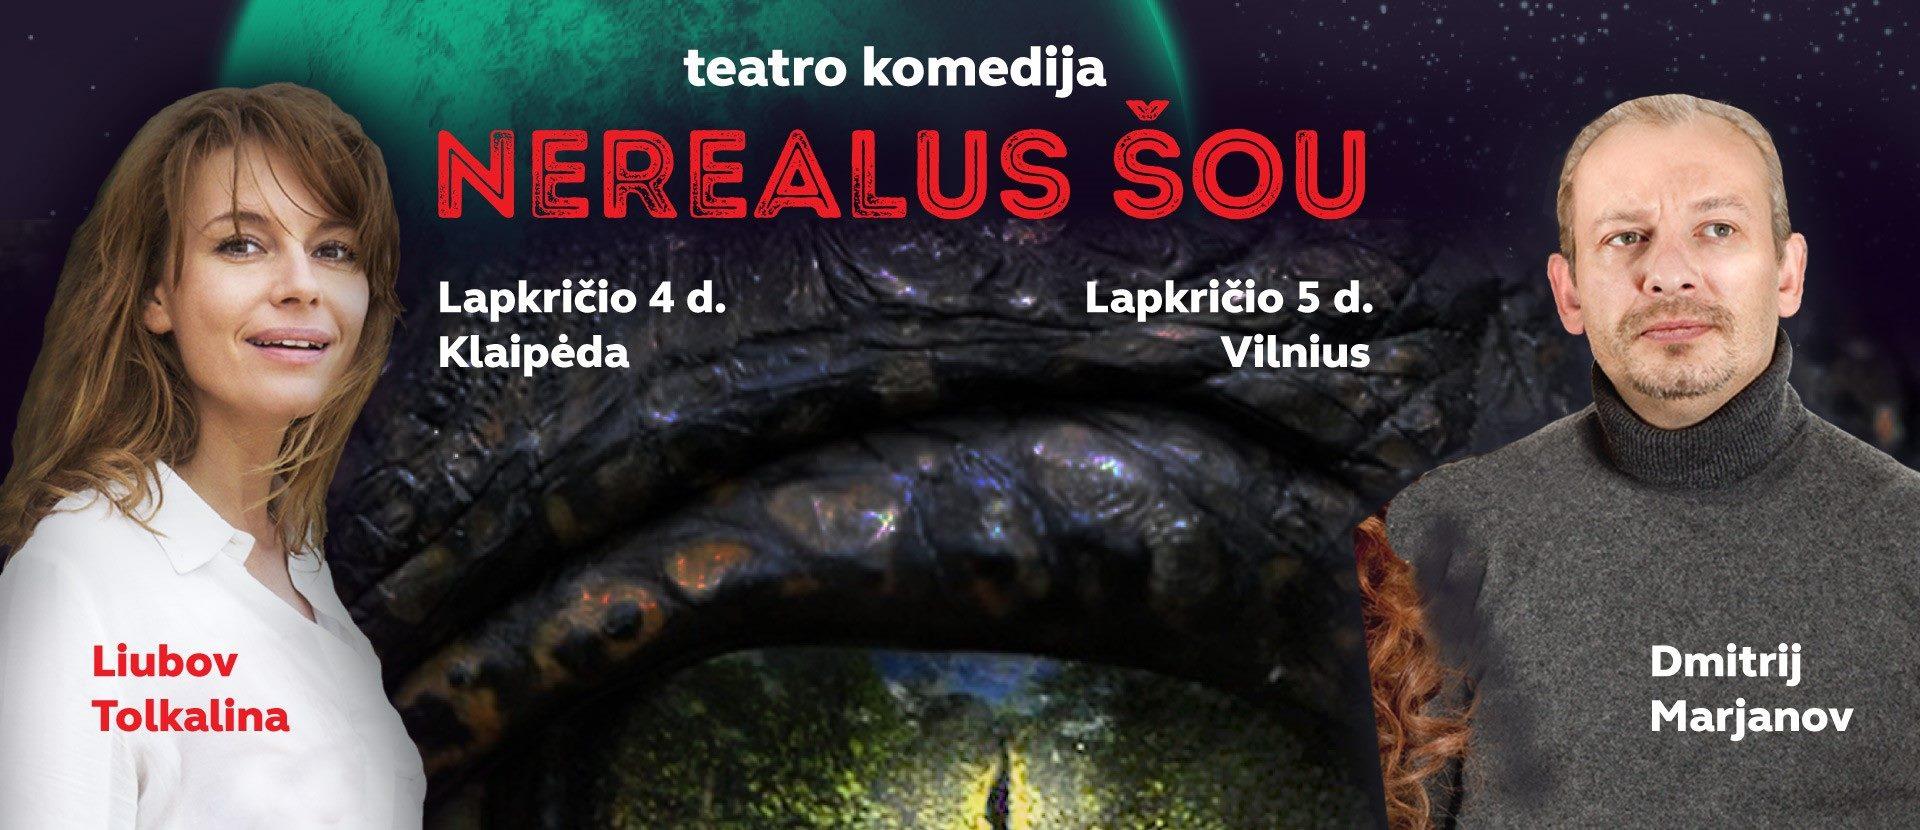 "Teatro komedija ""Nerealus šou"" / ""НЕРЕАЛЬНОЕ ШОУ"""